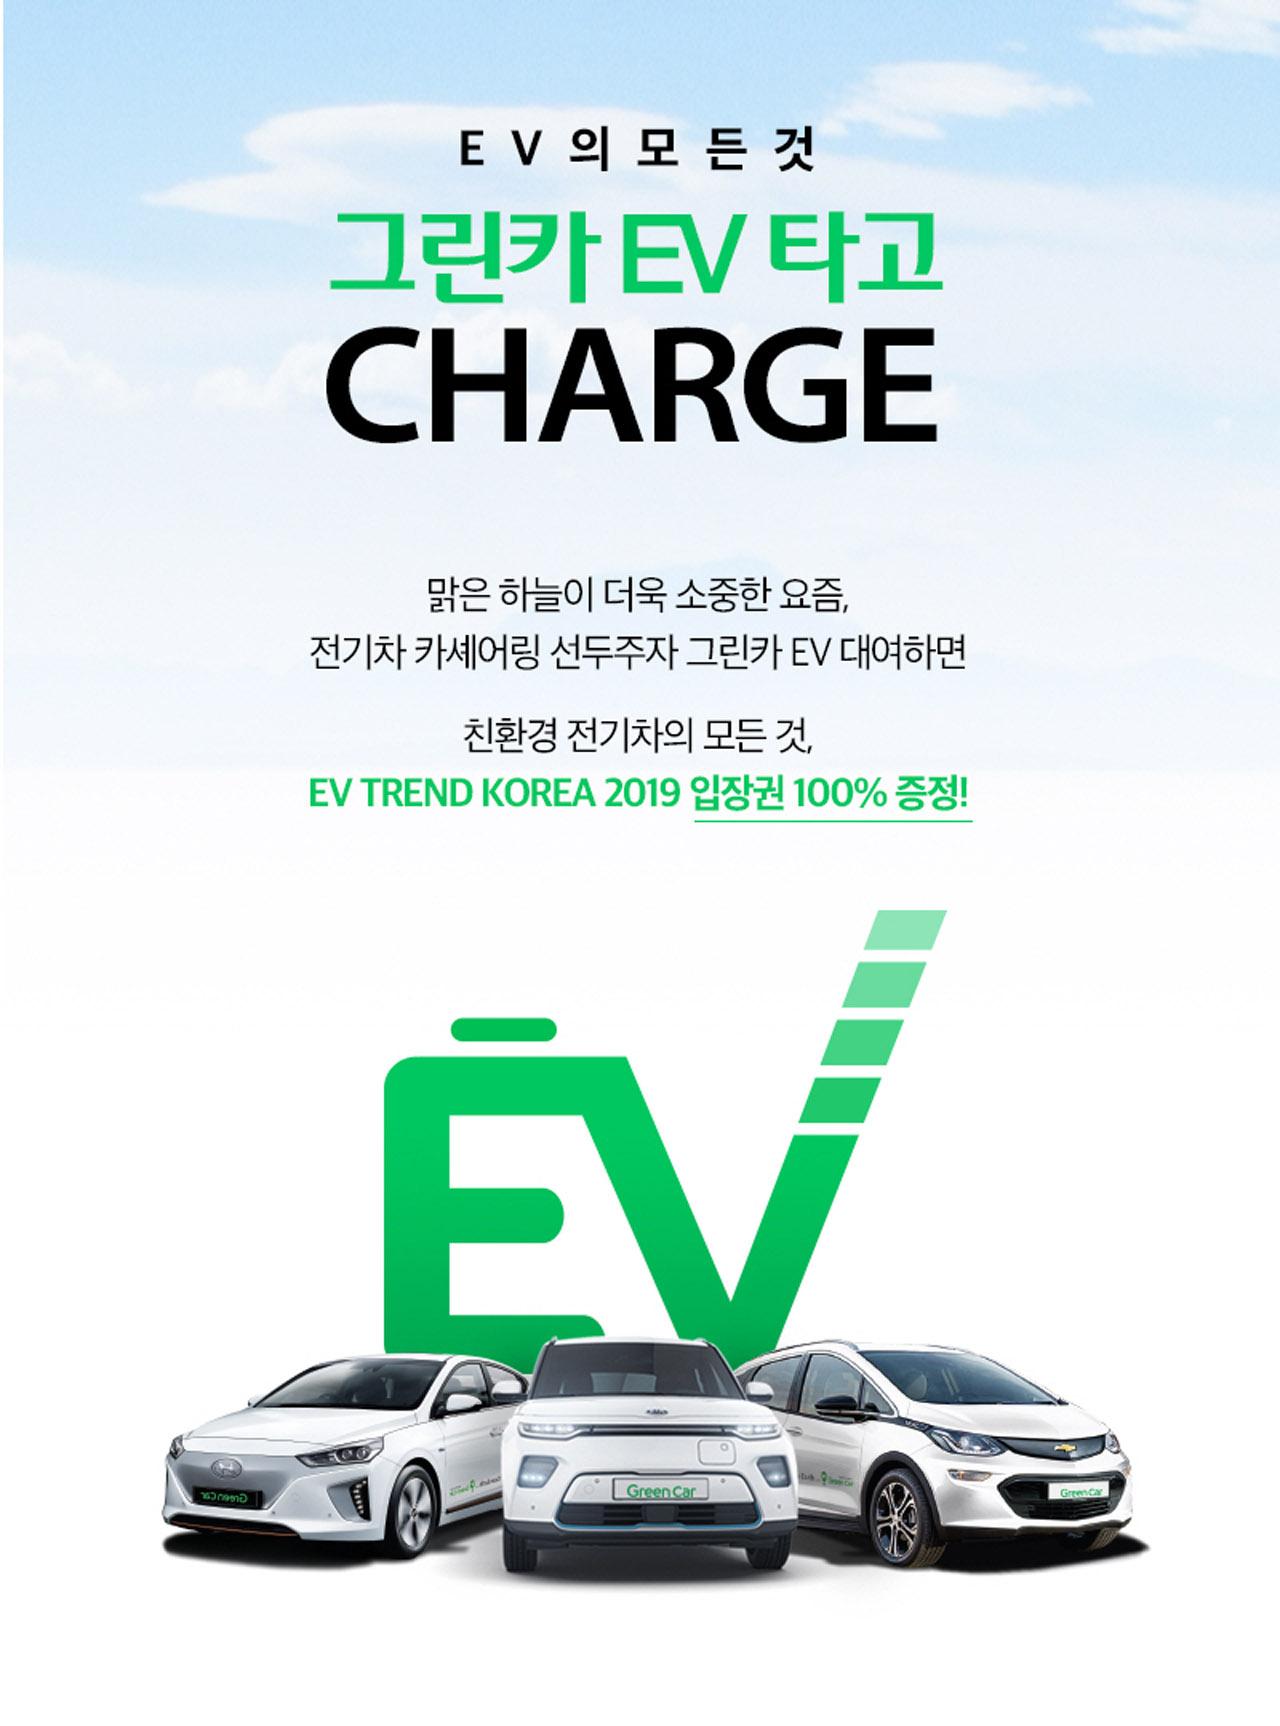 EV TREND KOREA 2019-그린카 이벤트 포스트